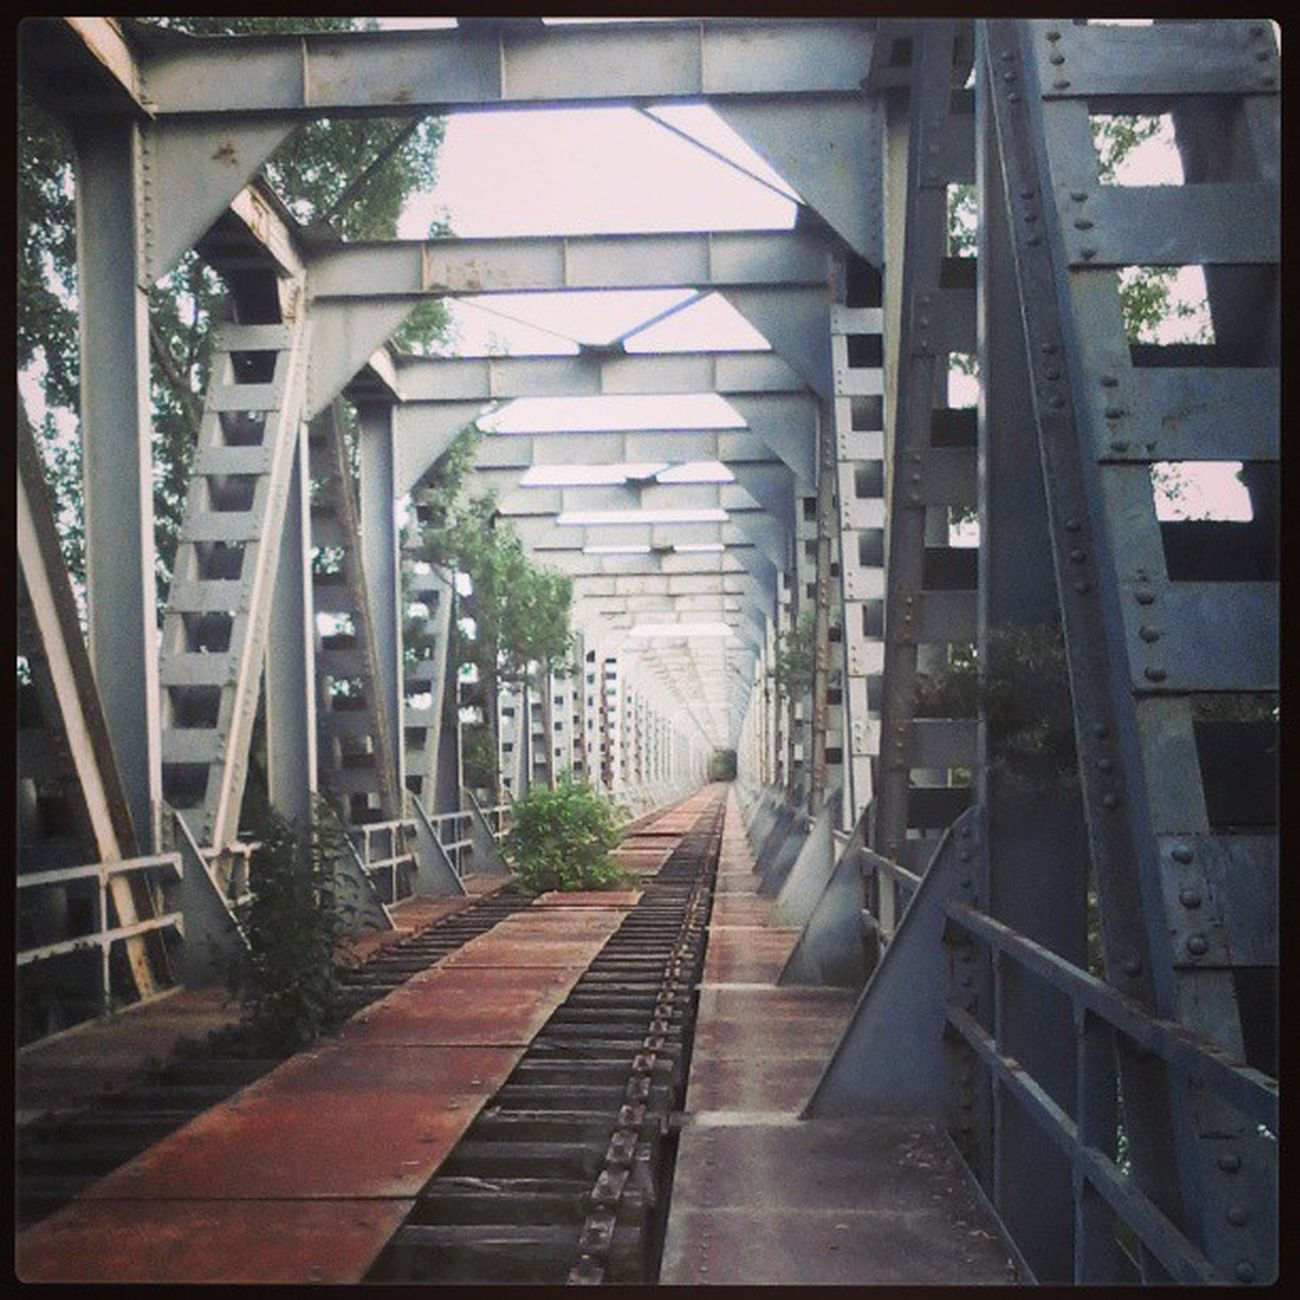 Bridge Oldbridge Old Exferrovia infinity way long beautiful